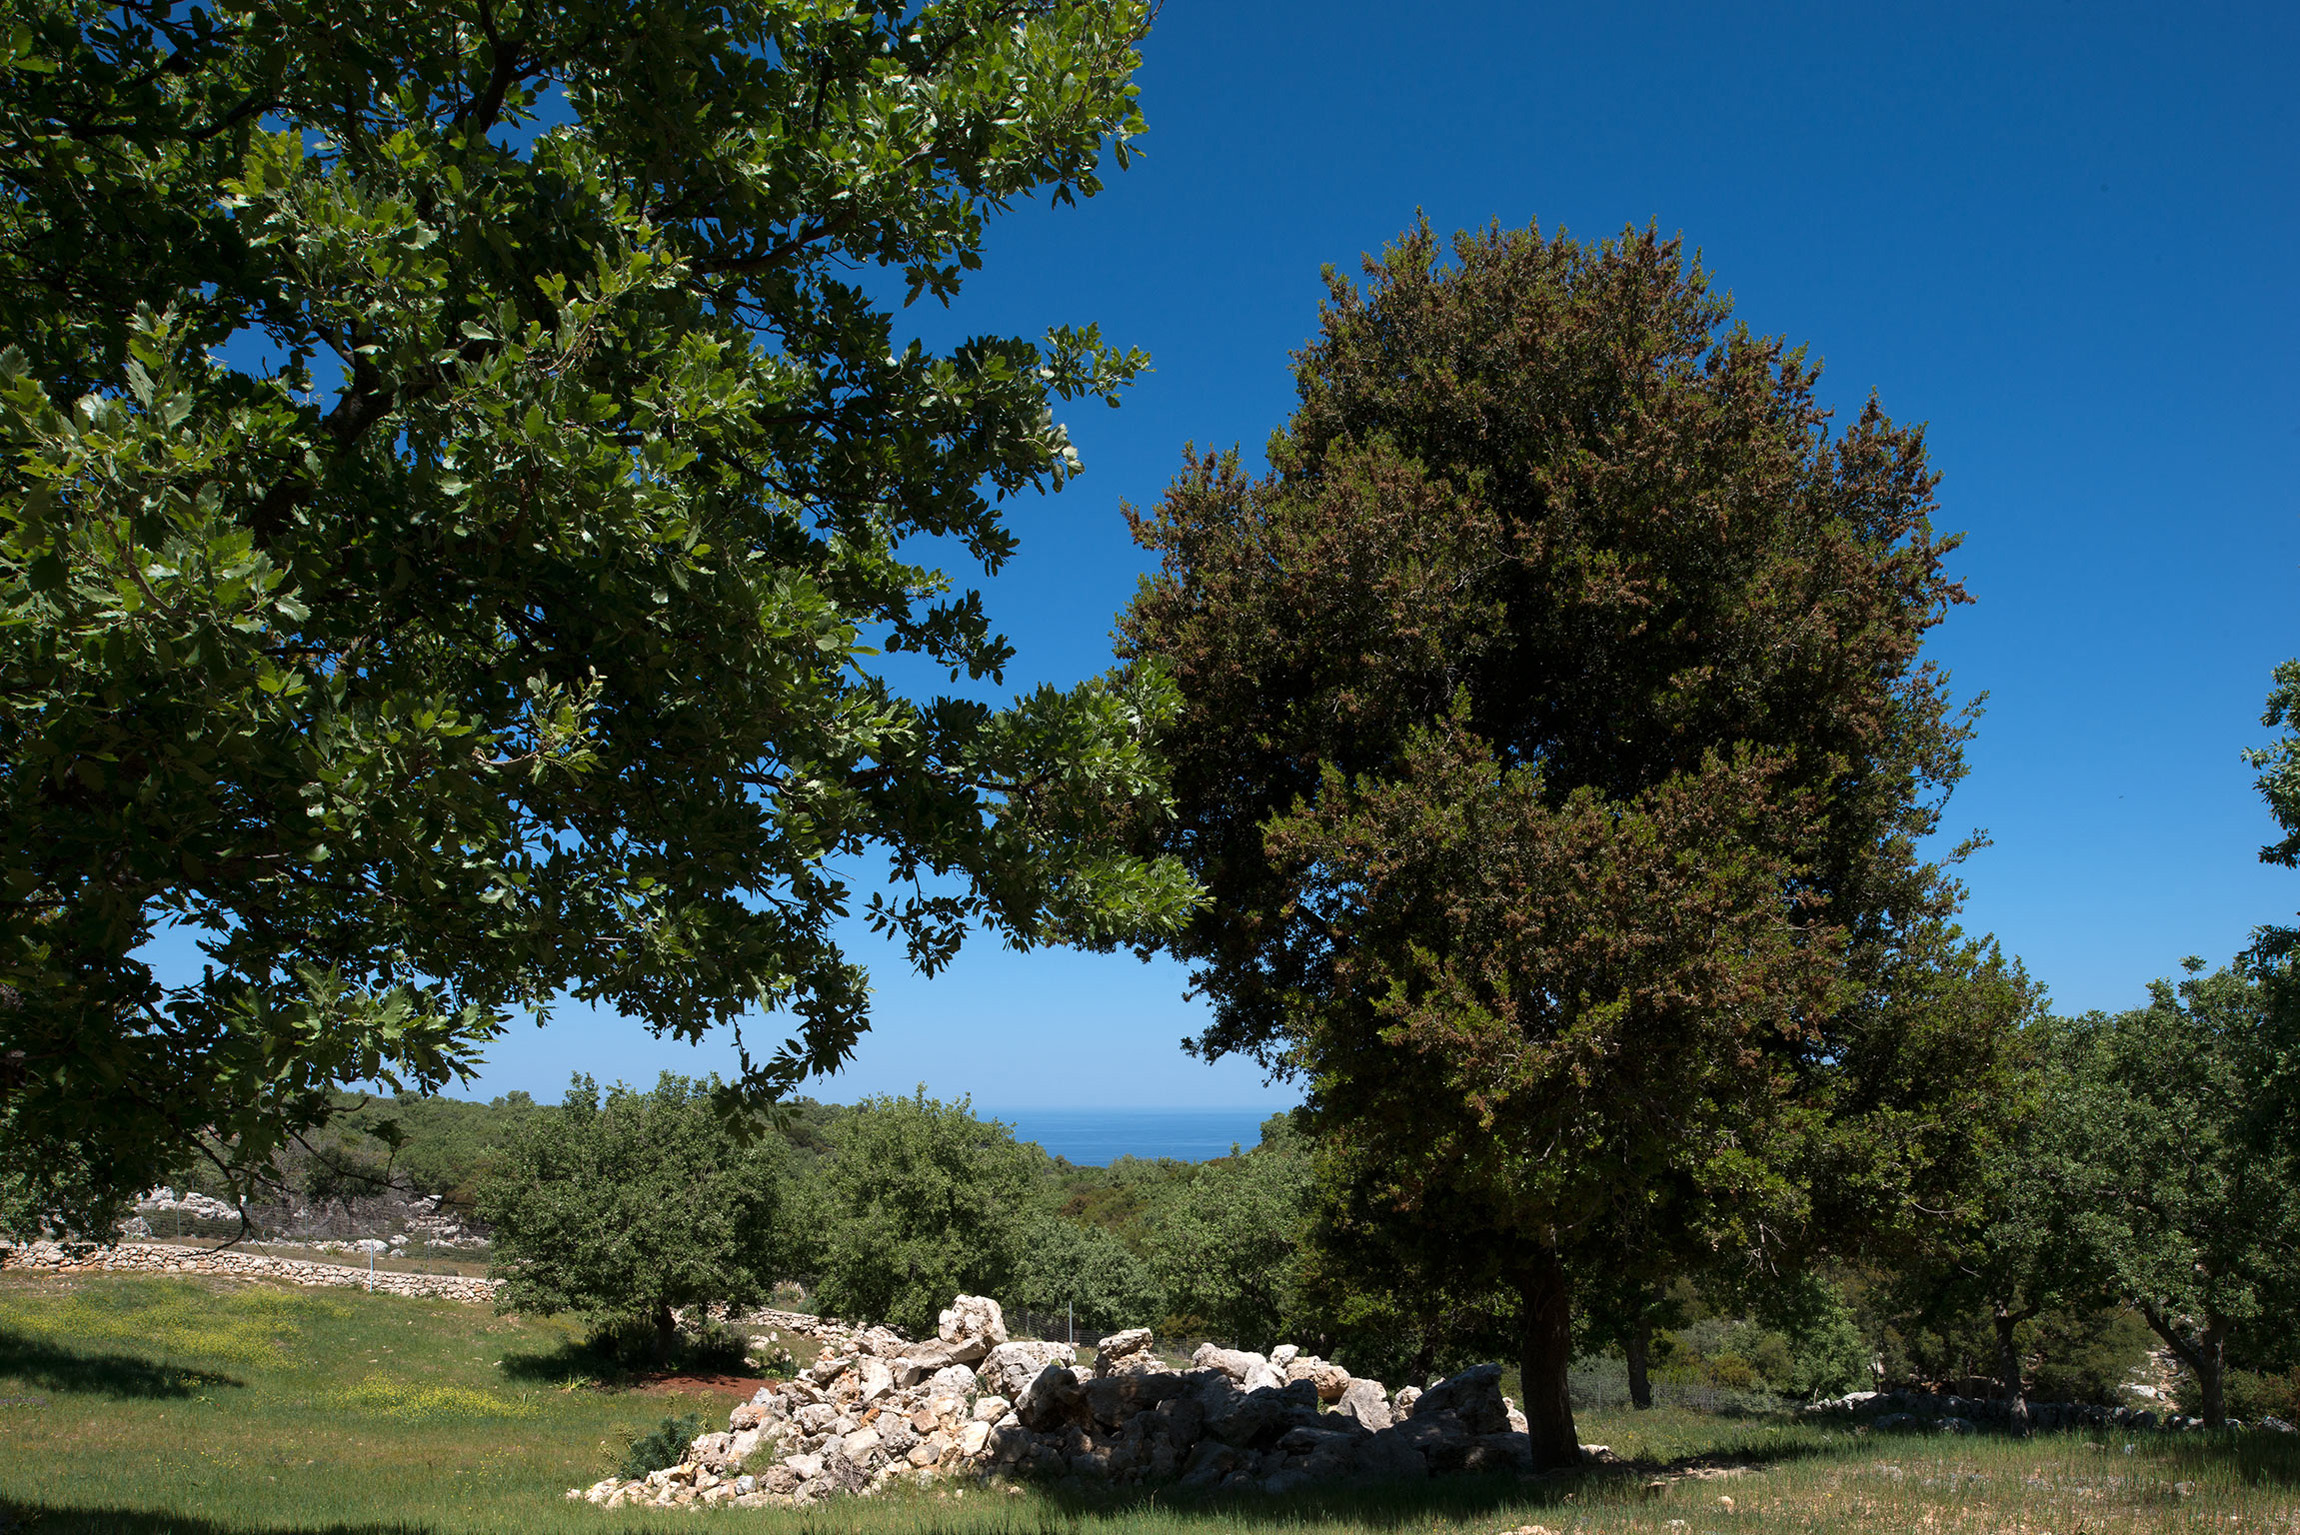 forest-villas-crete-farm-exterior-1.jpg